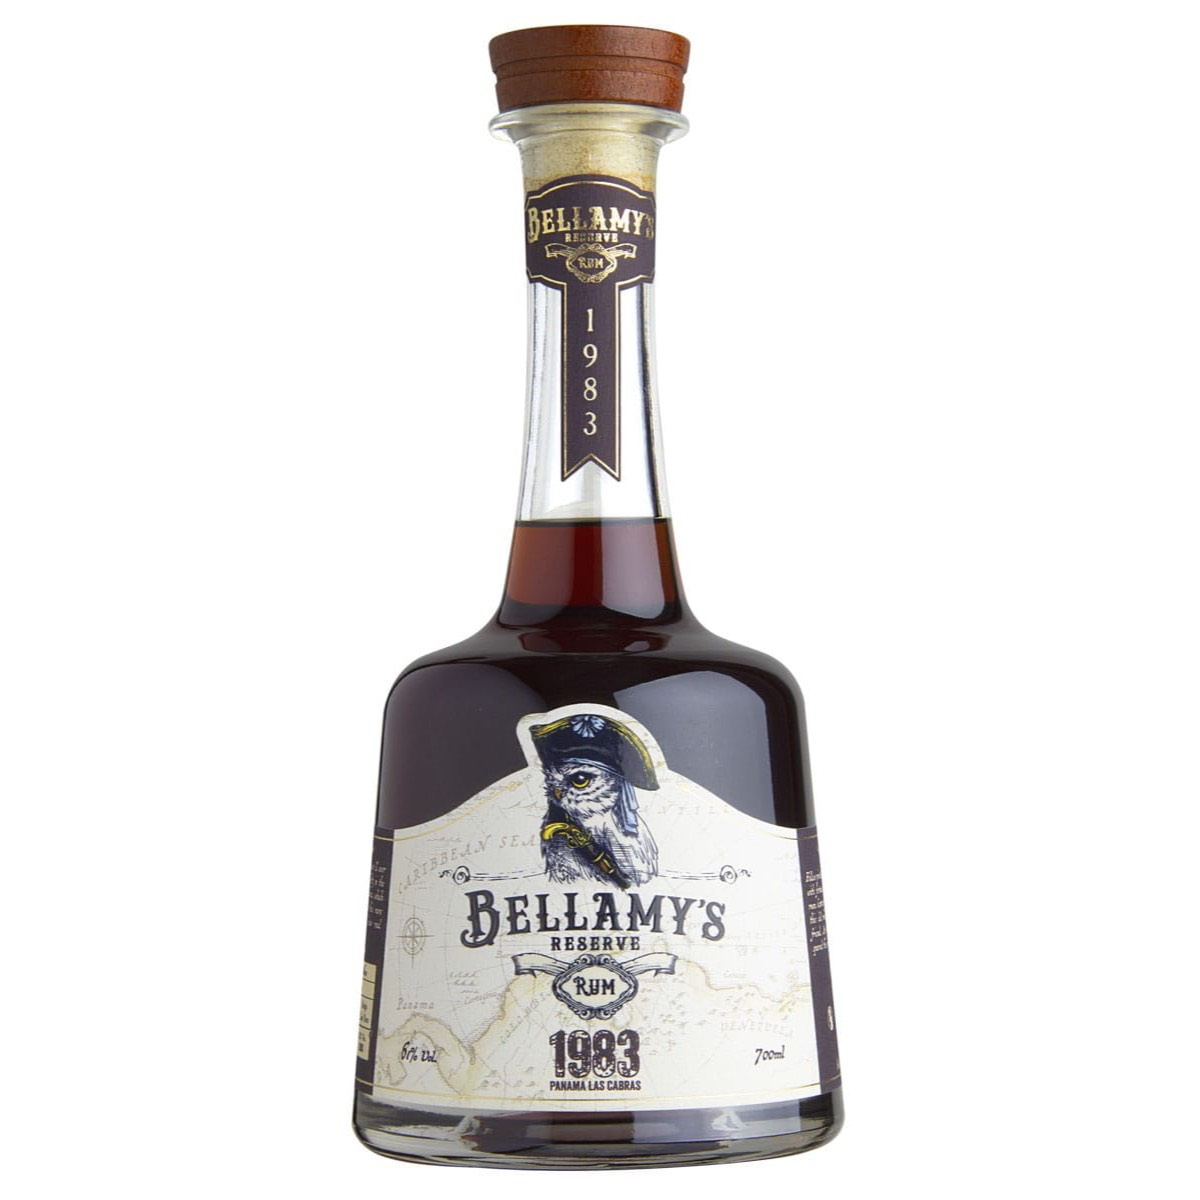 Bottle image of Bellamy's Reserve Panama